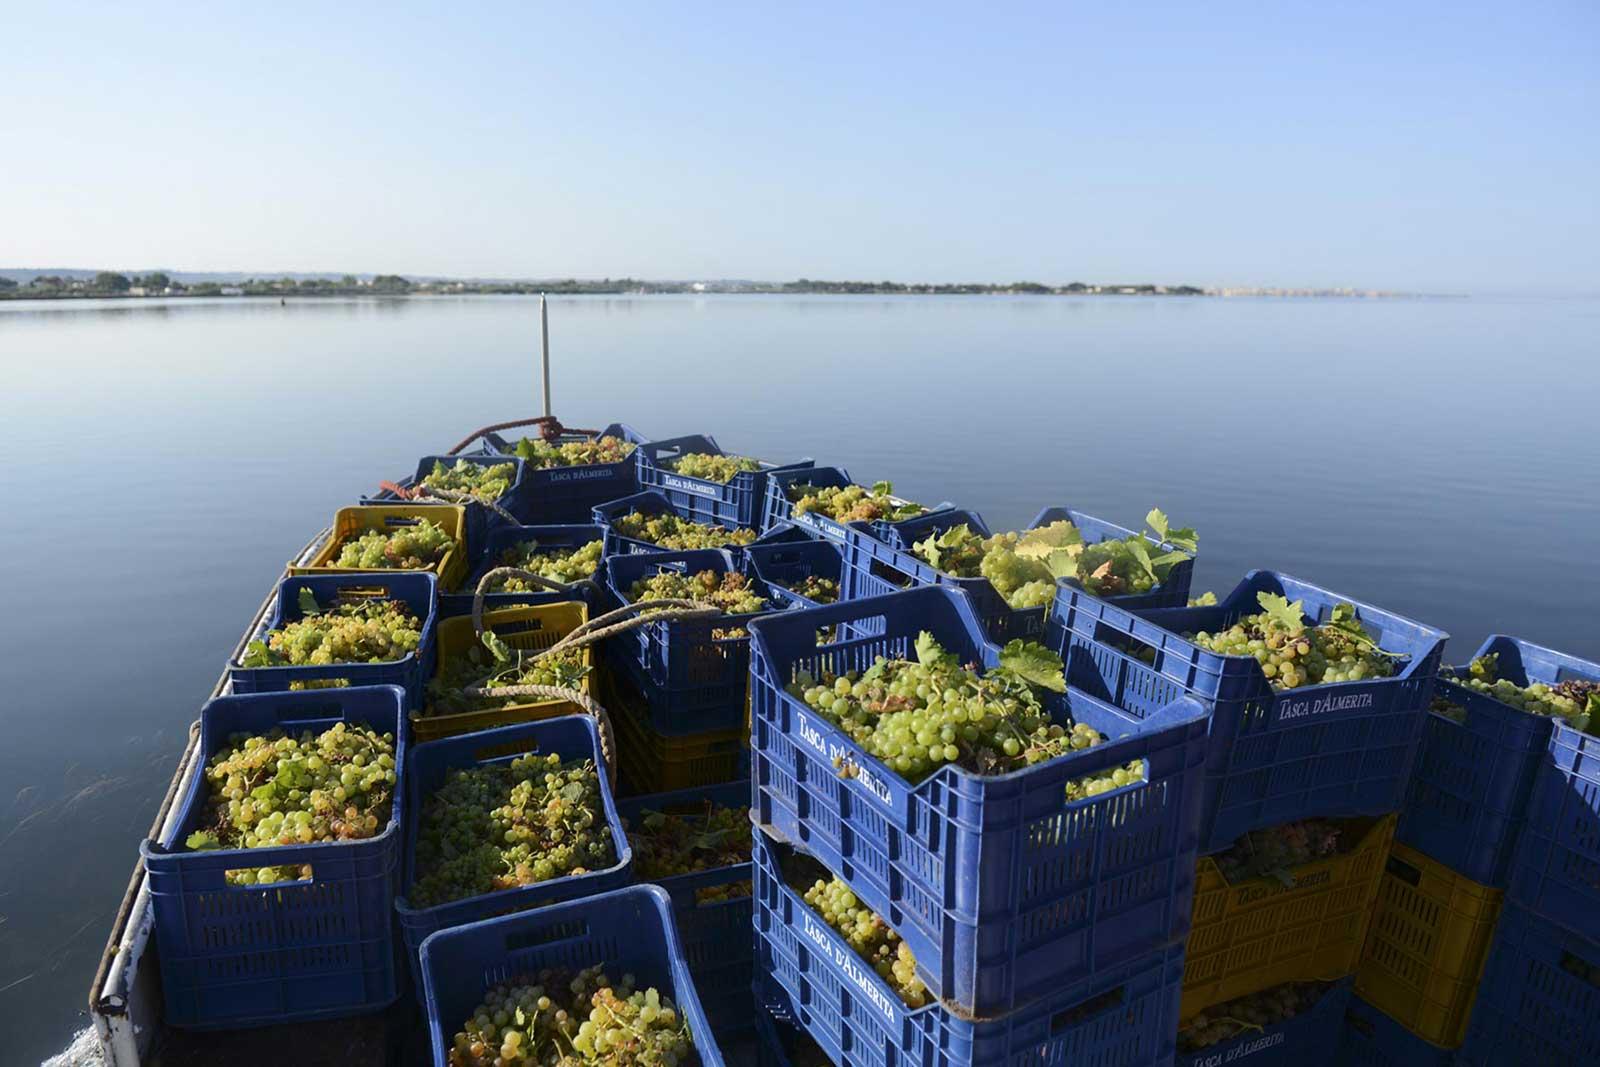 Bringing the grapes in from Mozia Island, Sicily. ©Tasca d'Almerita